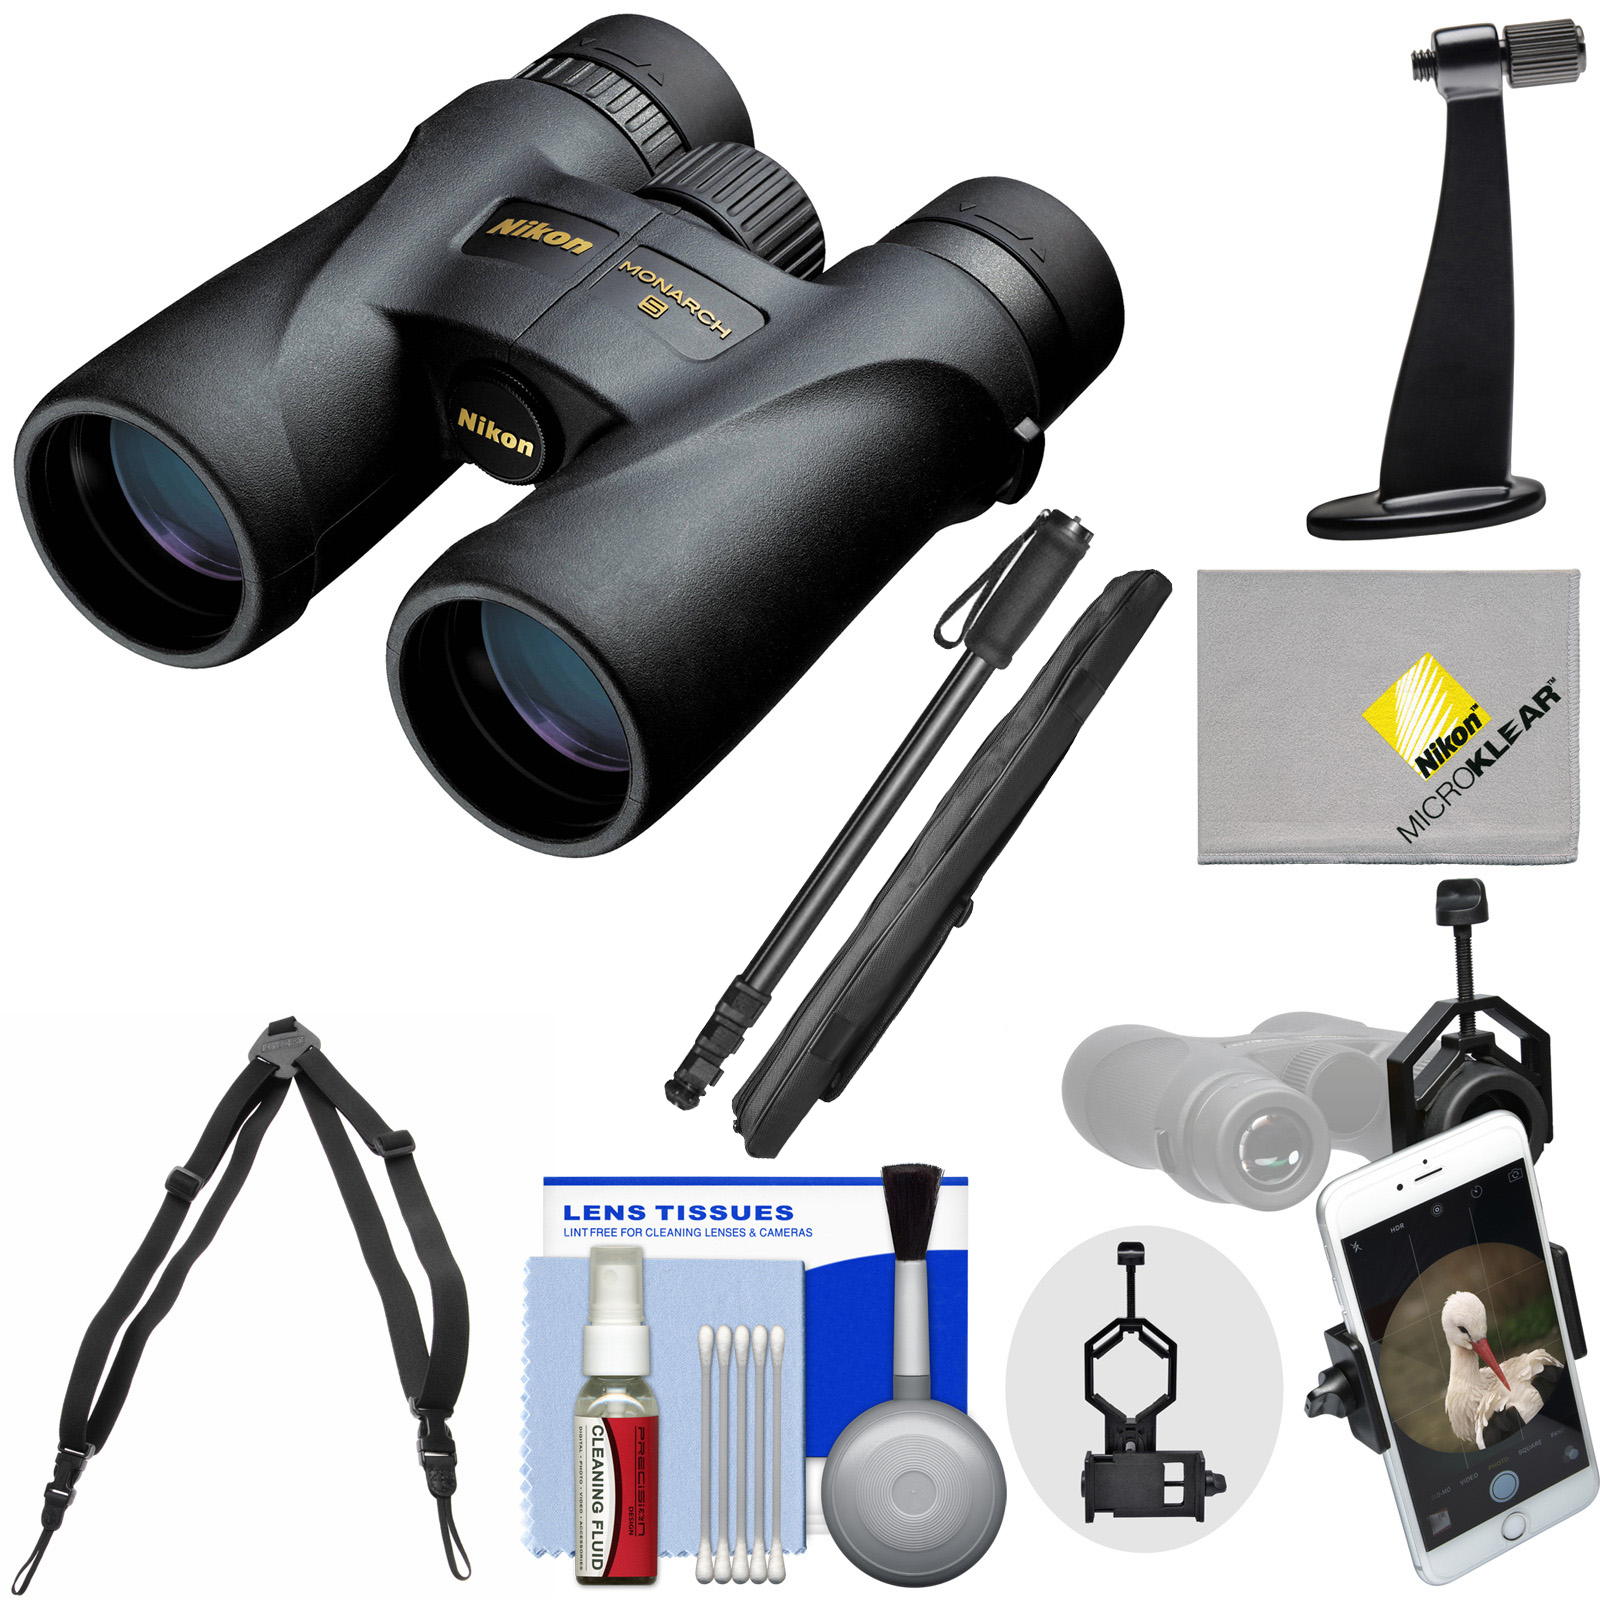 Nikon Monarch 5 8x42 ED ATB Waterproof / Fogproof Binoculars with Case + Harness + Smartphone and Tripod Adapters + Monopod + Cleaning Kit